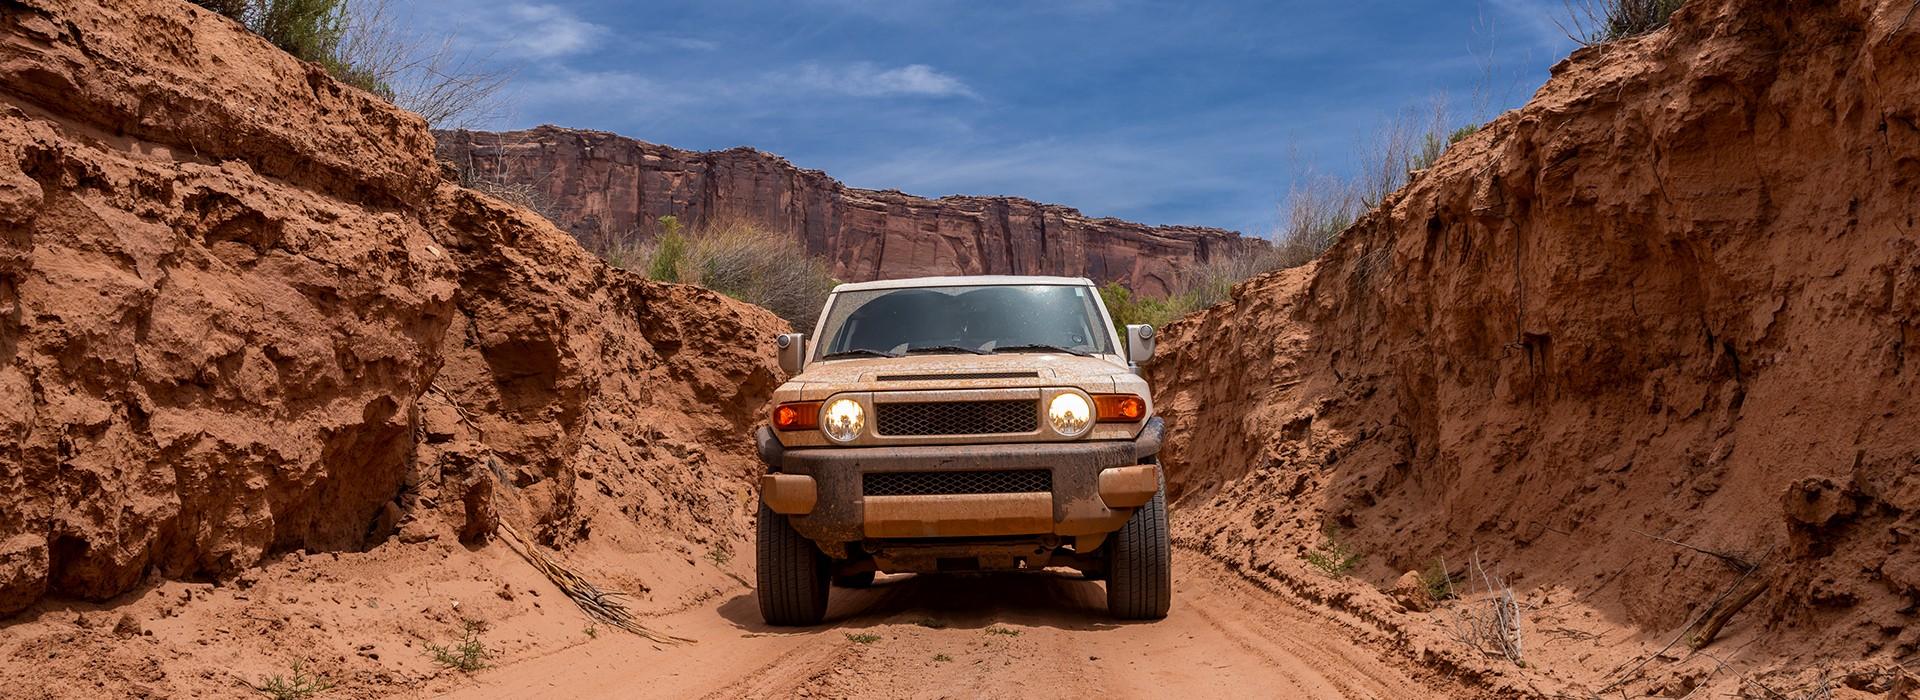 Off-roading in Utah